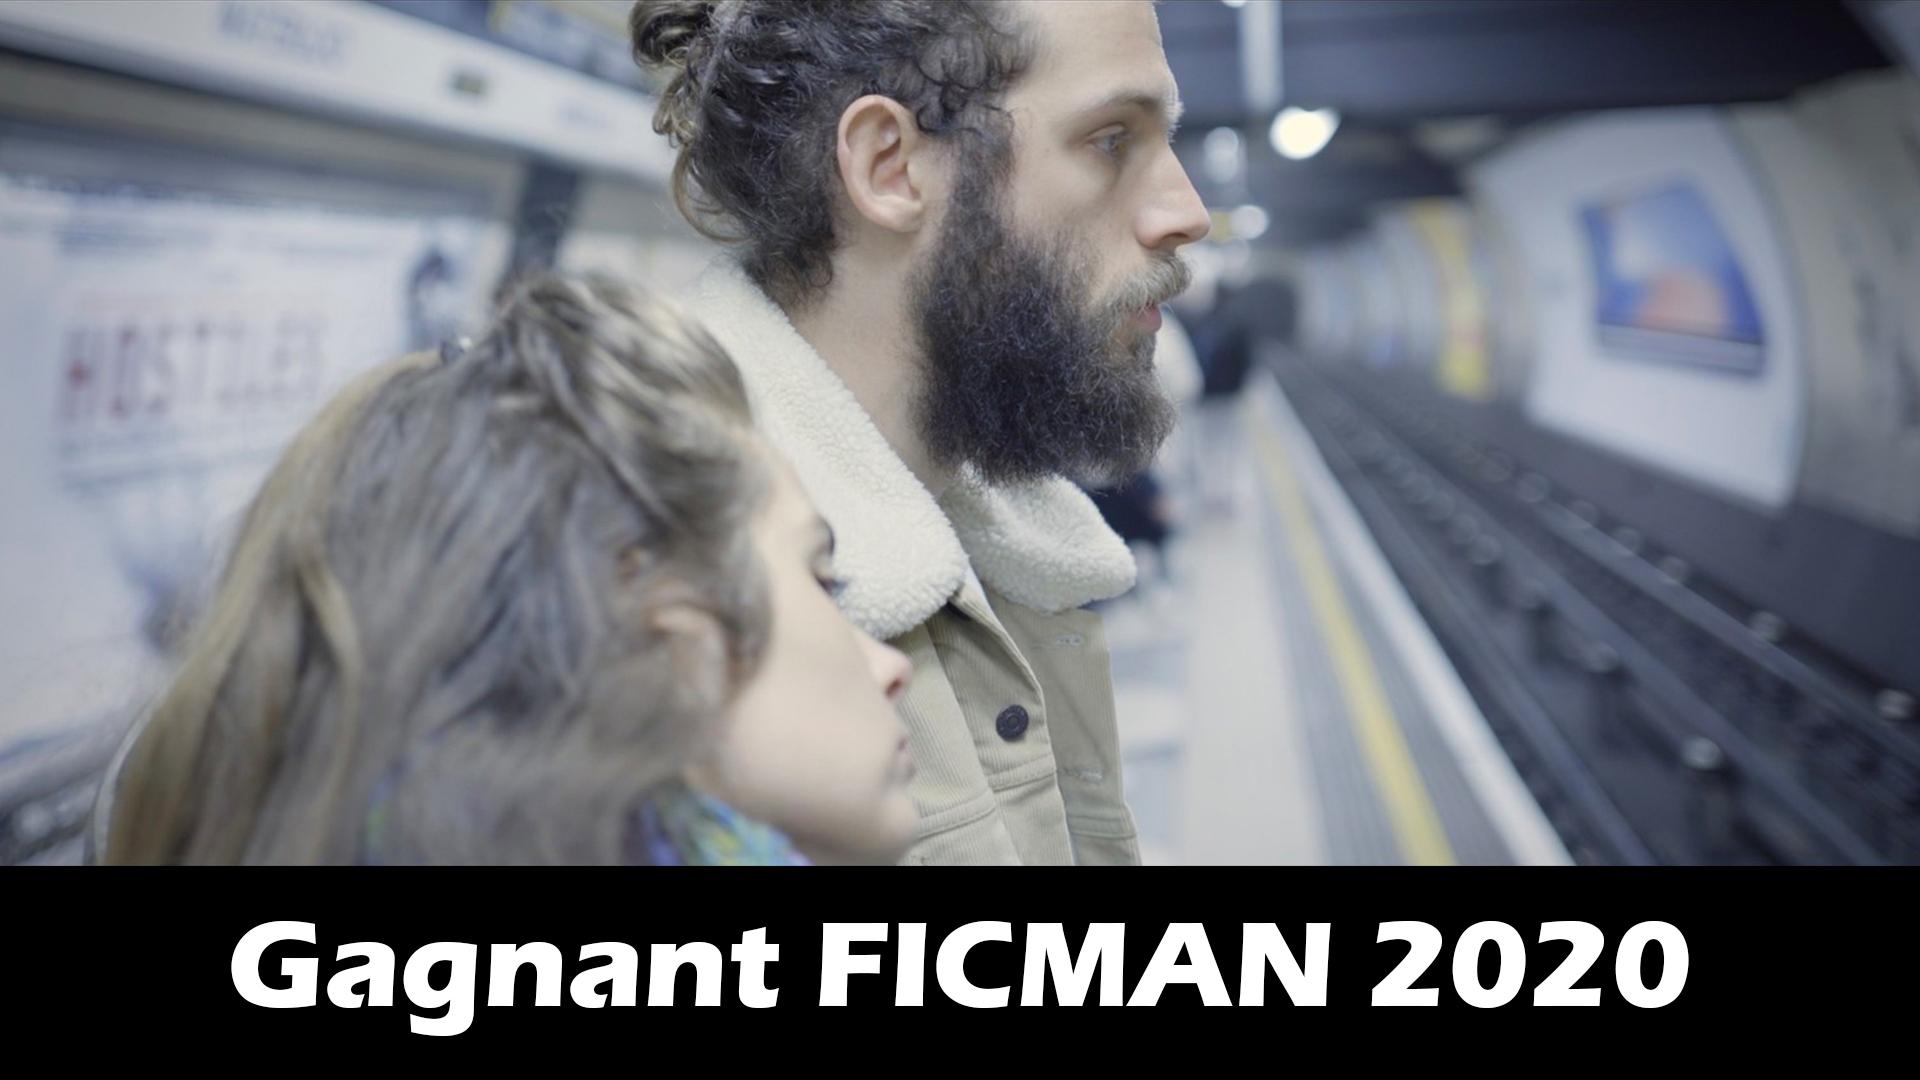 Gagnant du FICMAN 2020 – A Glimpse